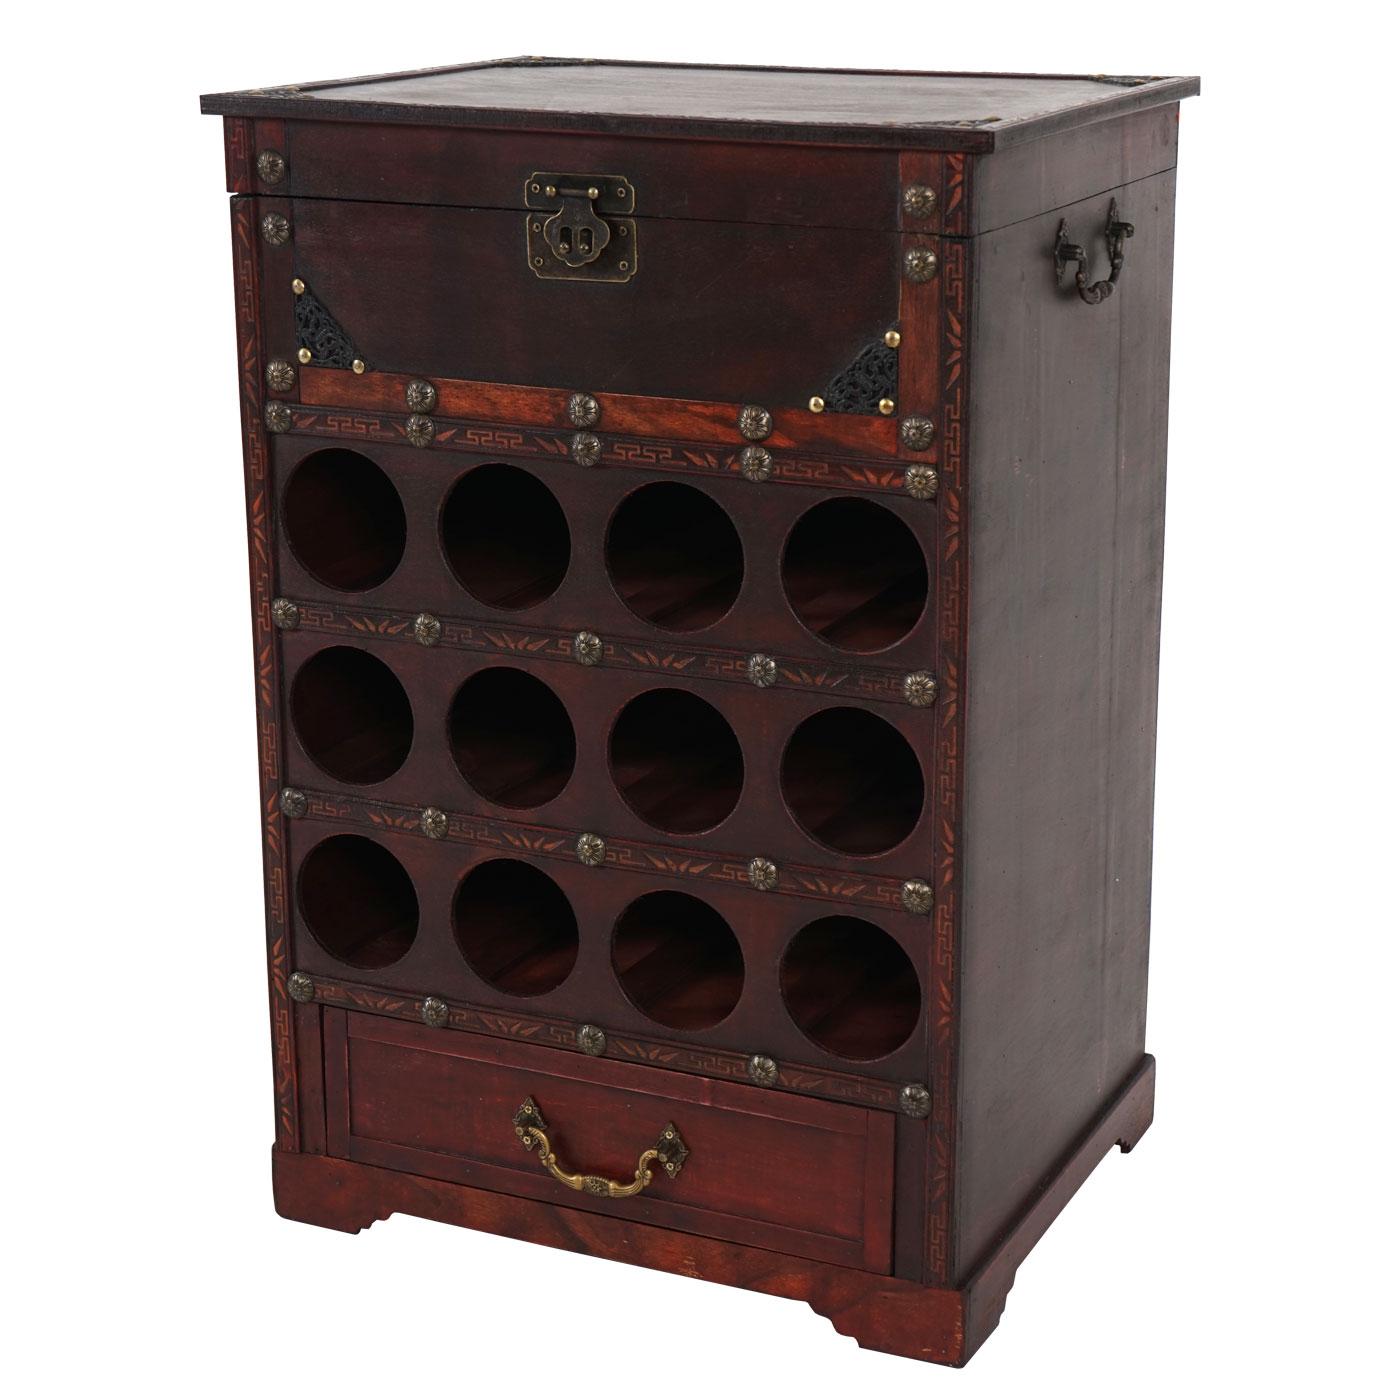 weinregal calvados t254 flaschenregal regal holzregal f r 12 flaschen kolonialstil 69x47x38 cm. Black Bedroom Furniture Sets. Home Design Ideas